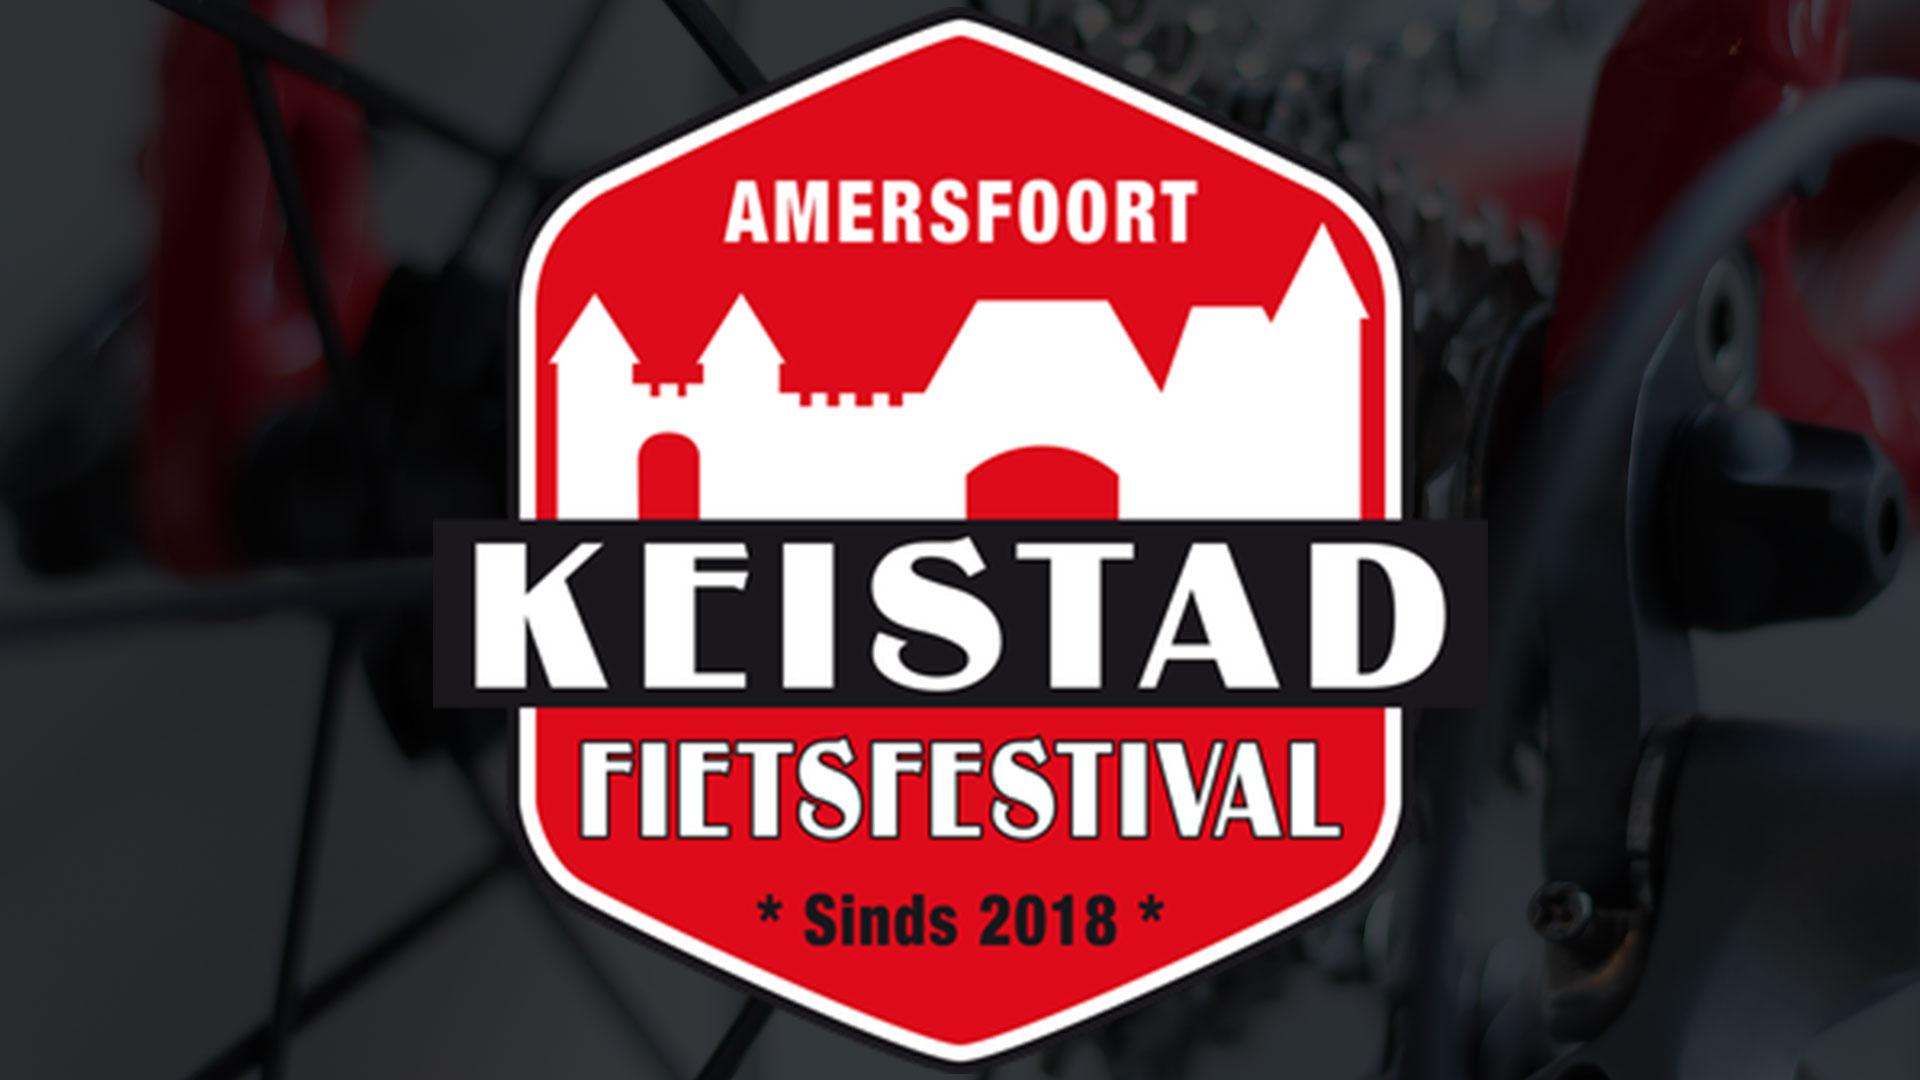 Keistad Fietsfestival Amersfoort: 11 t/m 14 oktober 2018